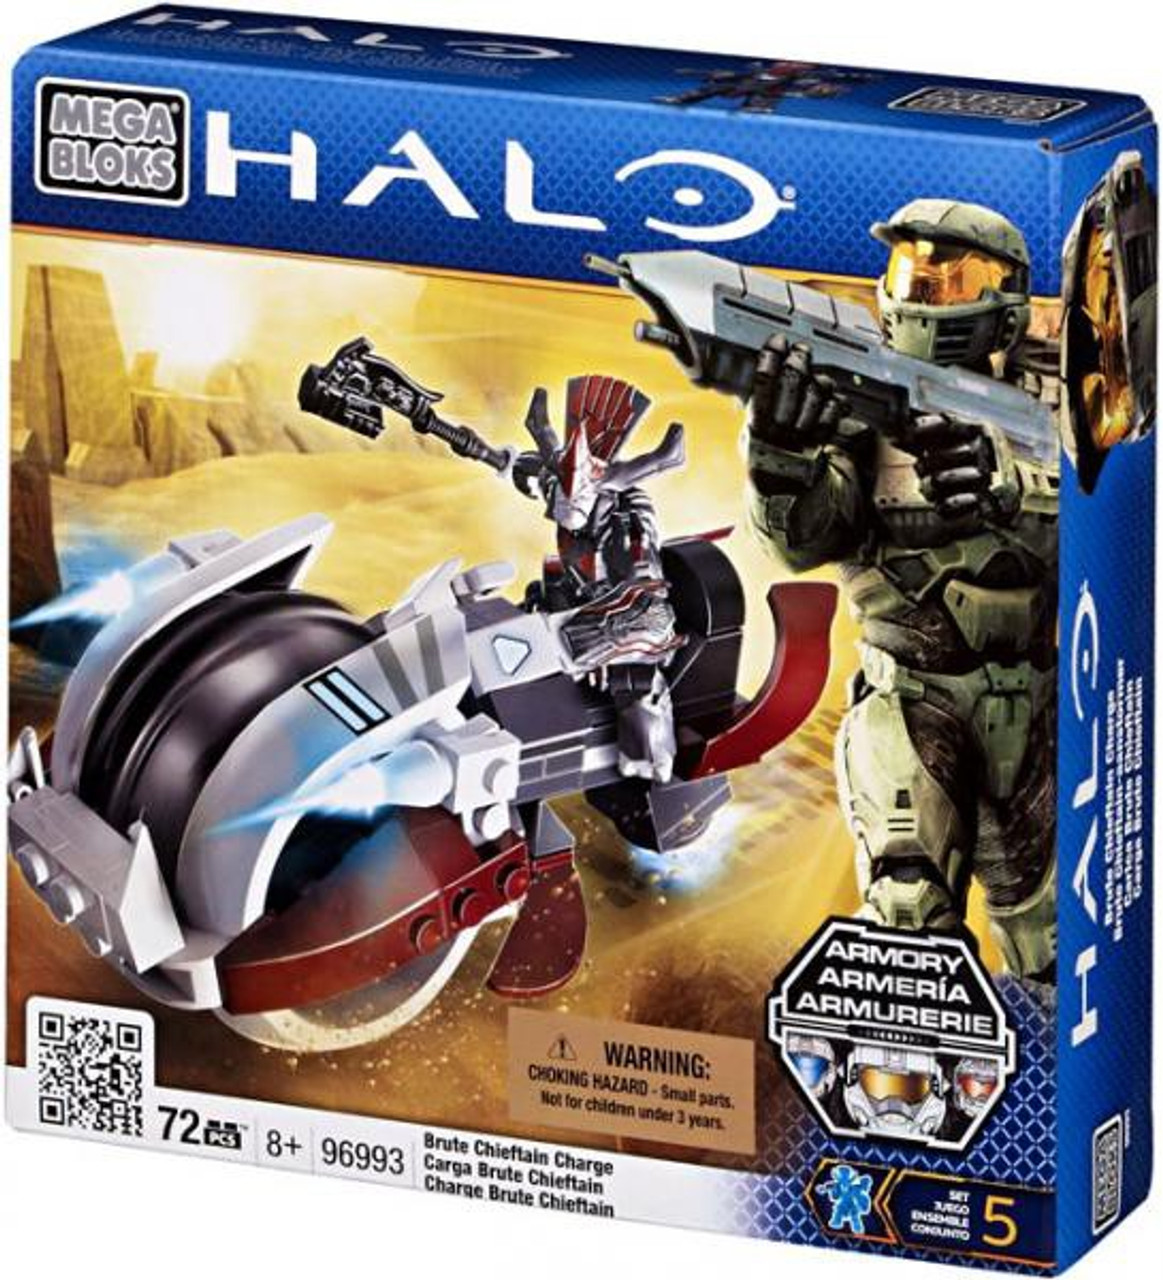 Mega Bloks Halo Brute Chieftain Charge Set #96993